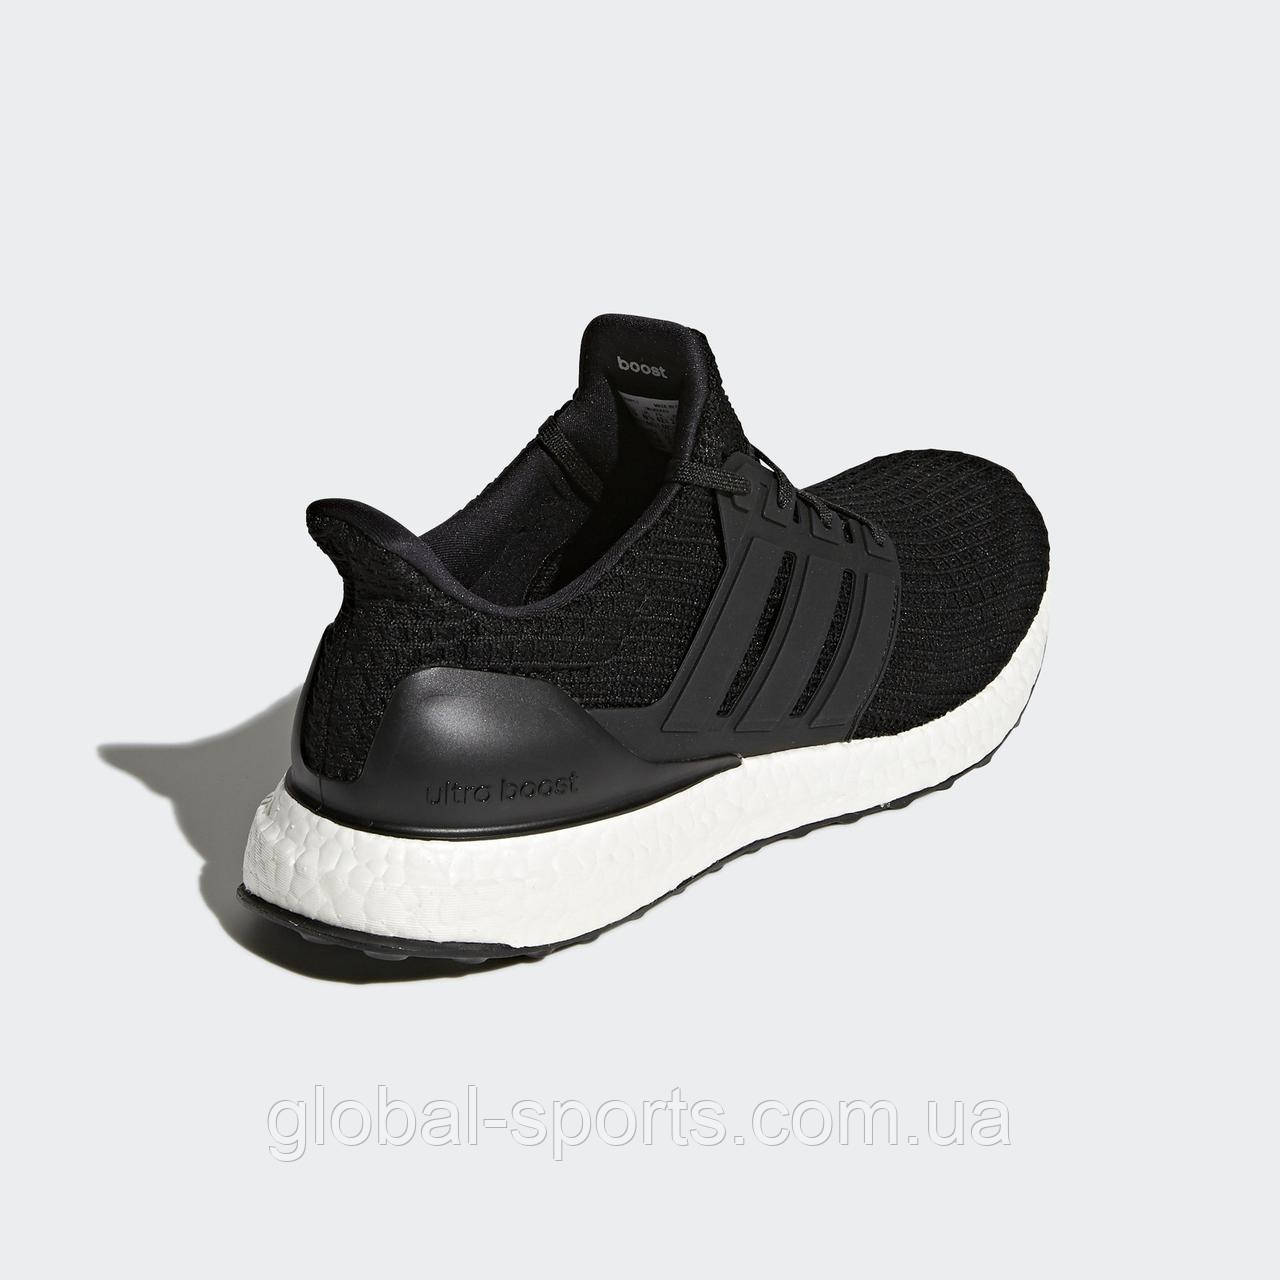 f51bb8d1 ... Мужские кроссовки для бега Adidas Ultraboost M(Артикул:BB6166), ...